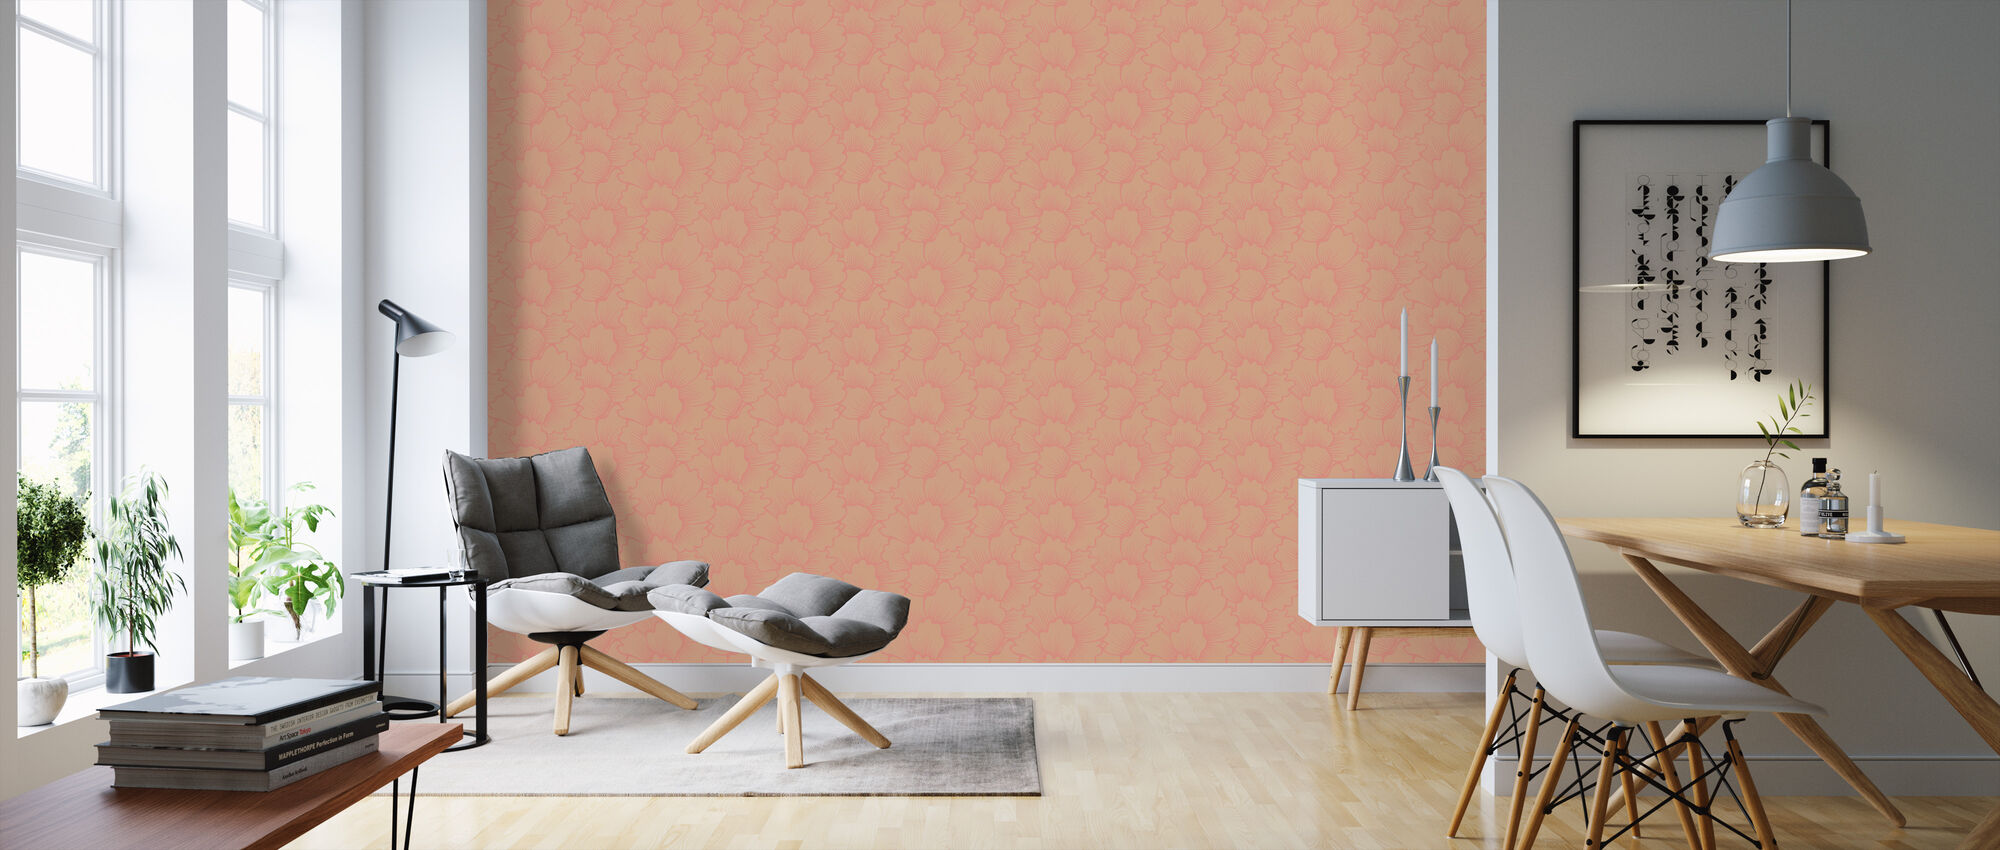 Mayormente rosa coral sobre rosa - Papel pintado - Salón